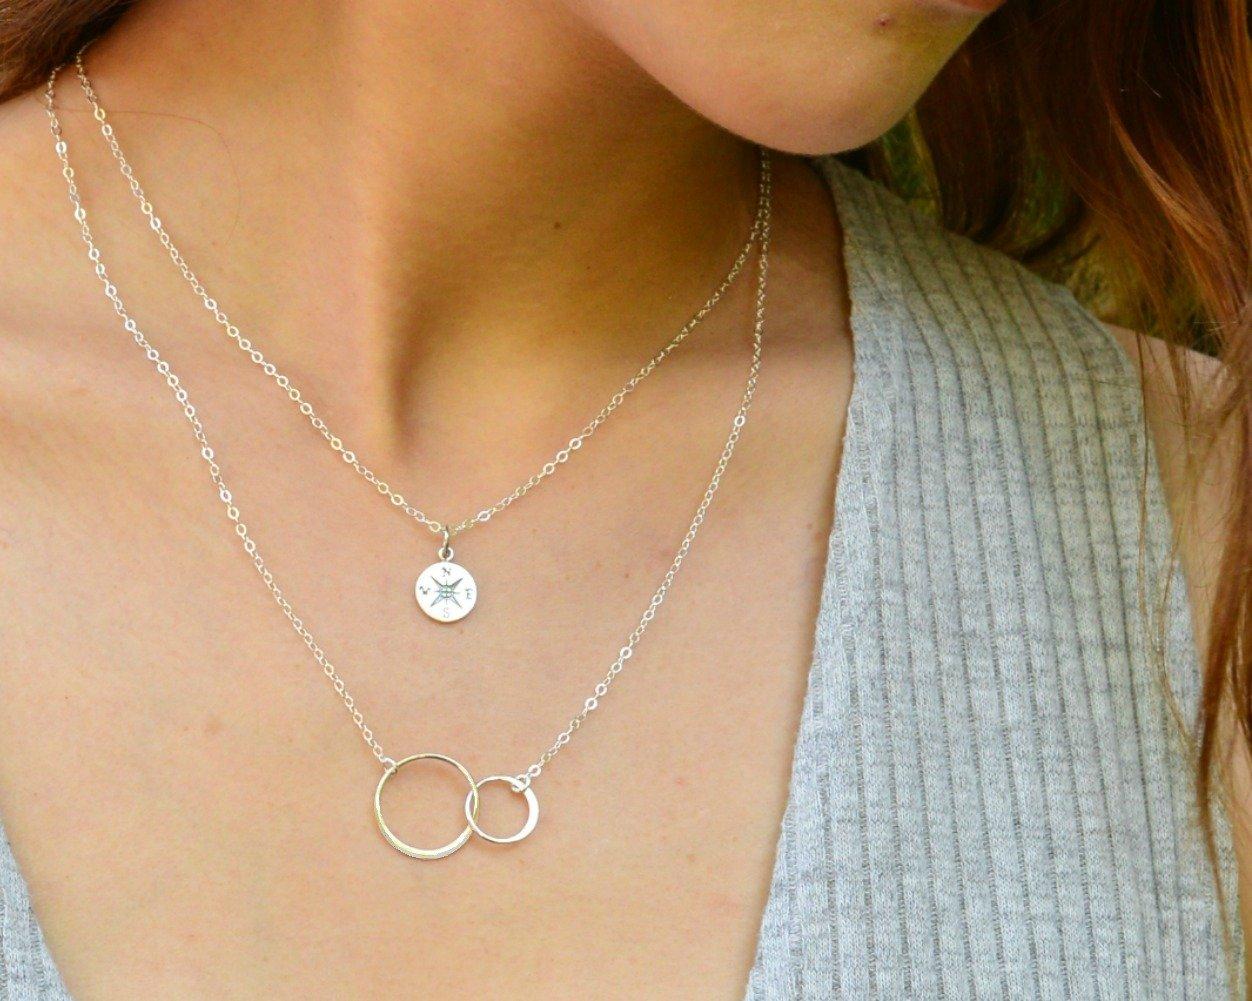 EFYTAL Godmother Gifts from Godchild Sterling Silver Interlocking Circle Necklace Proposal Gift for Girl Baptism by EFYTAL (Image #2)